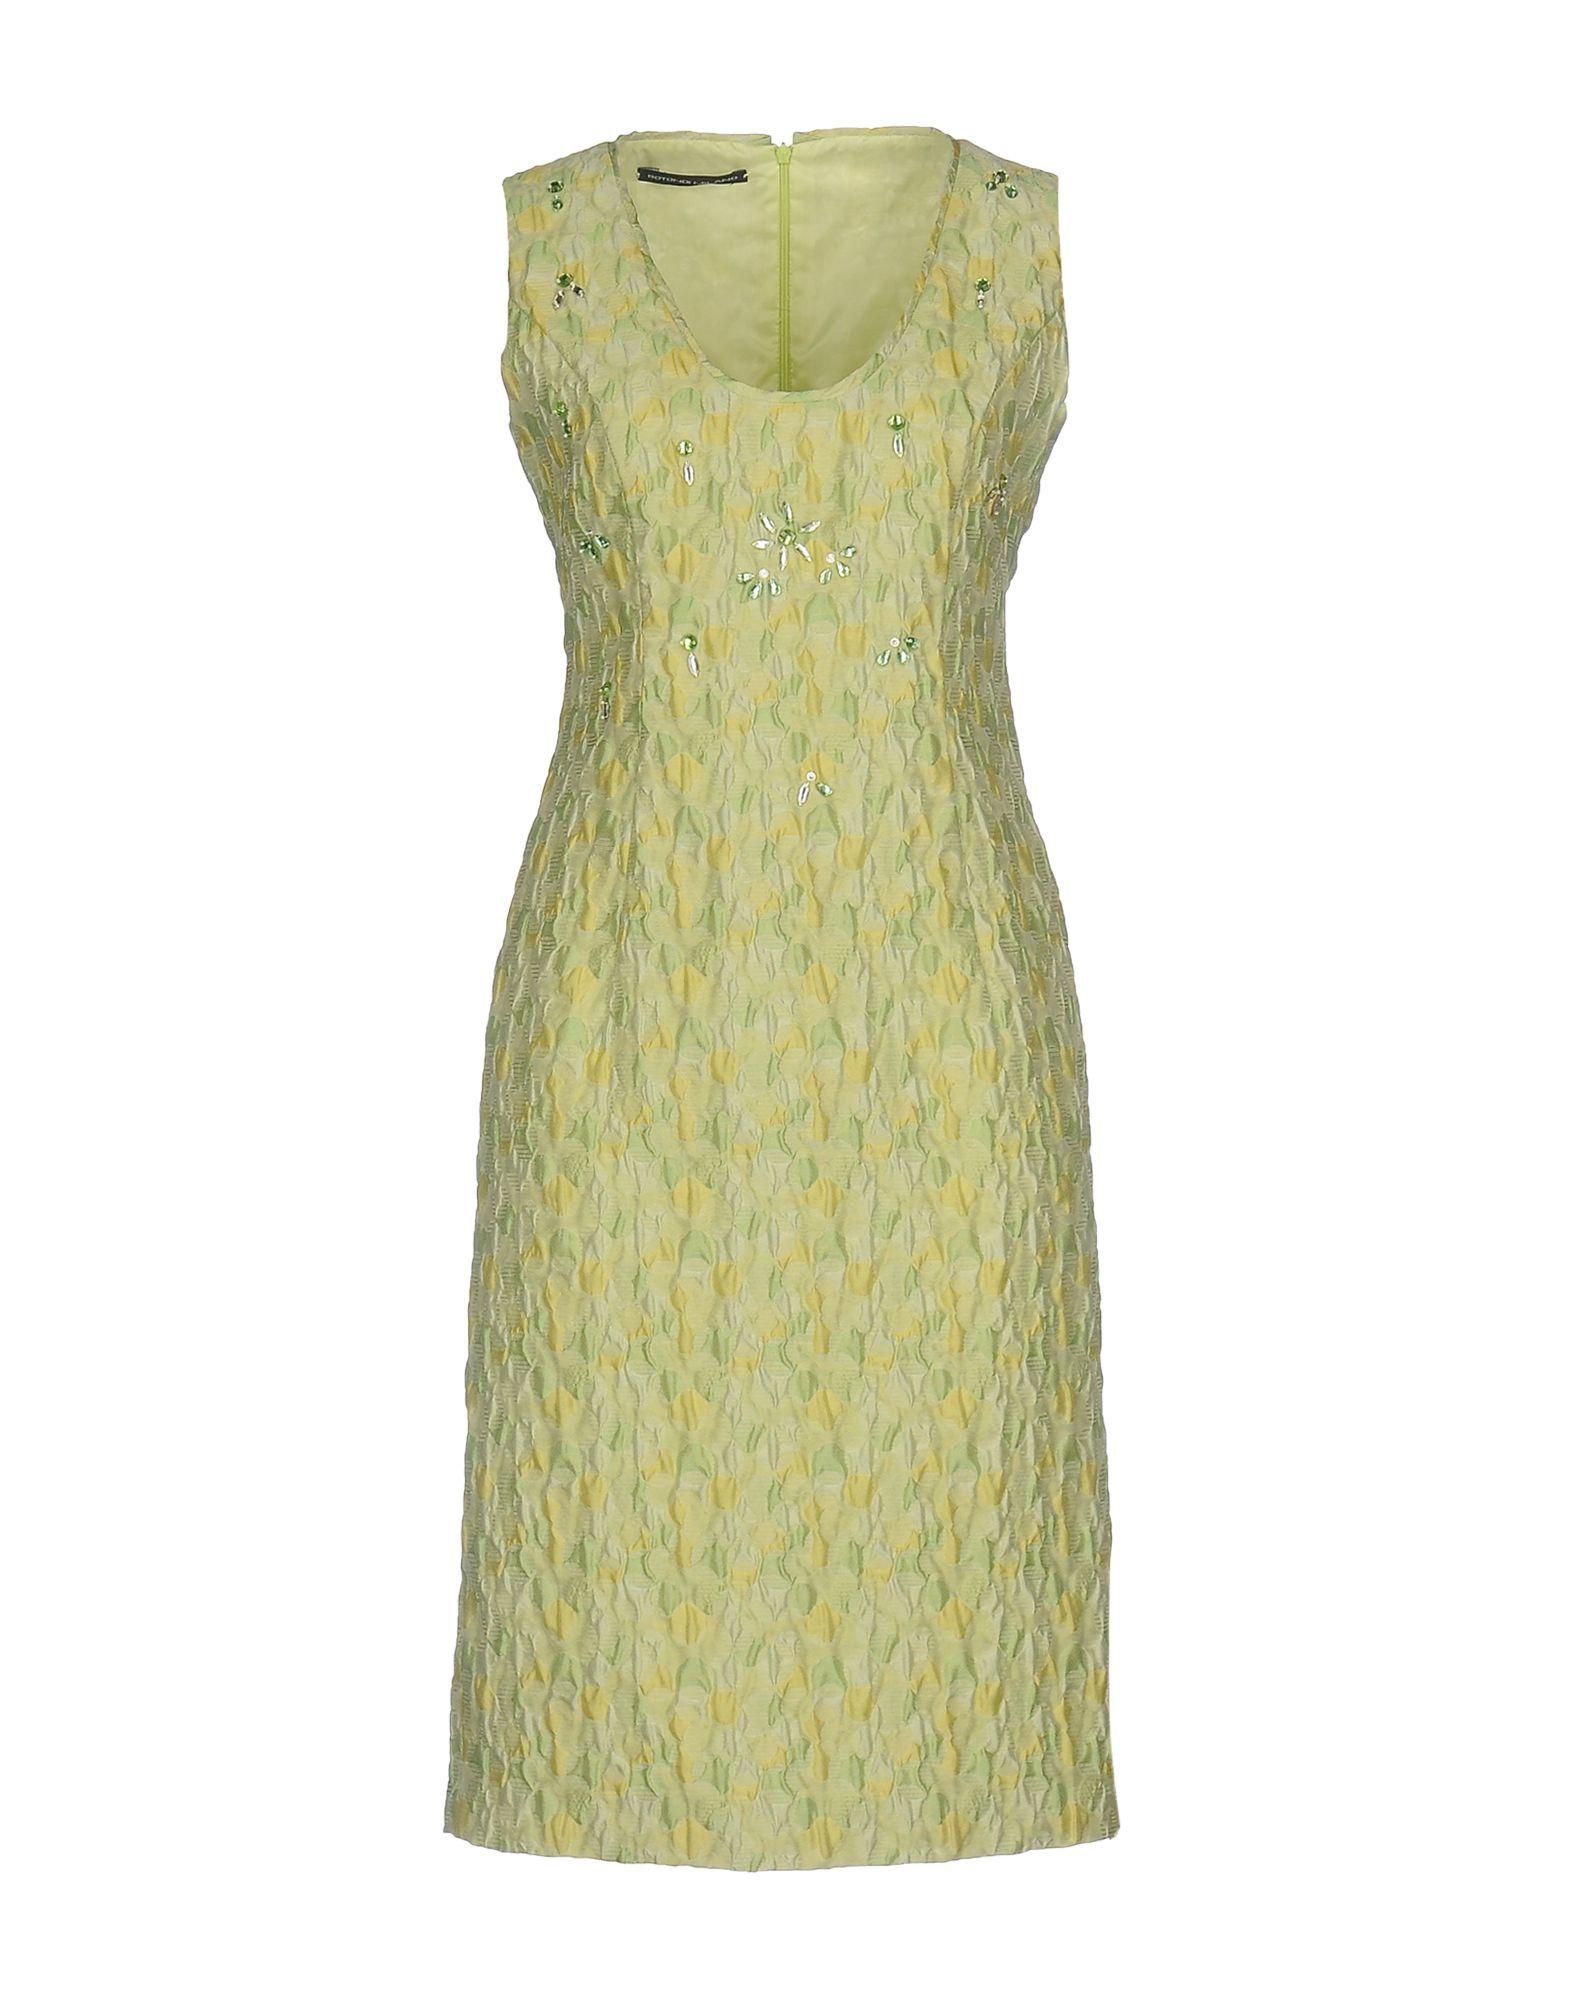 BOTONDI MILANO Короткое платье botondi milano платье до колена